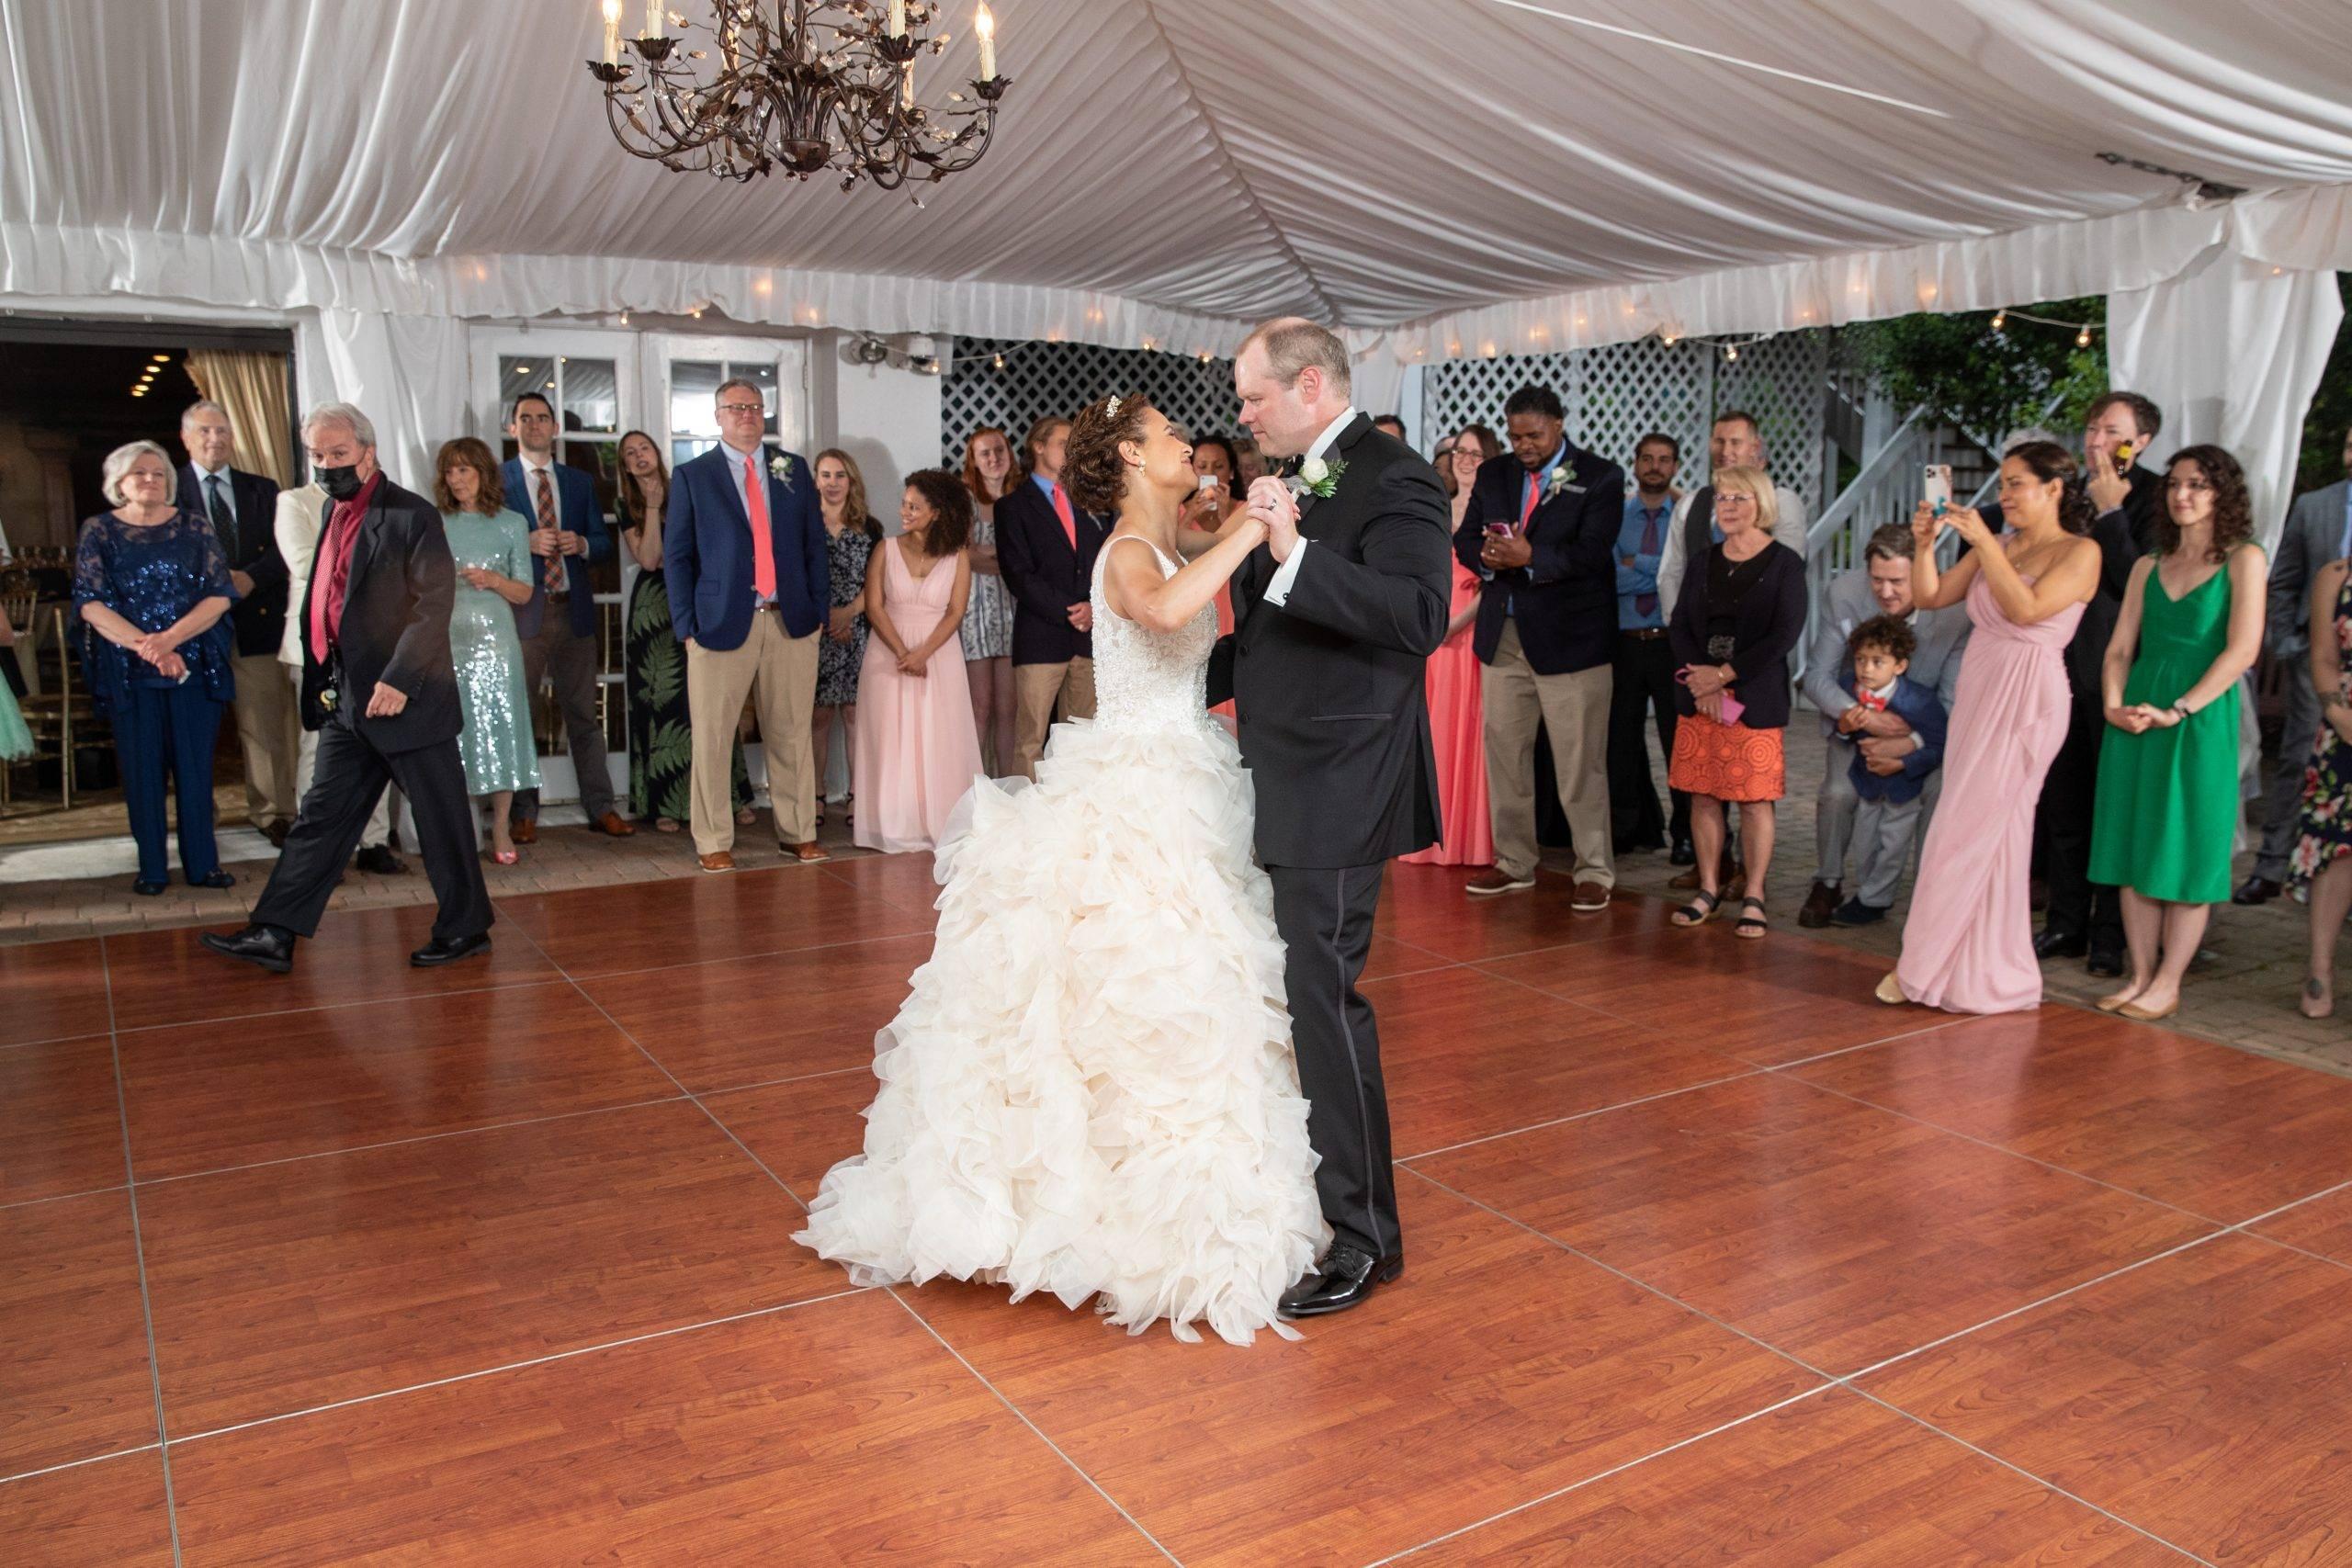 Olde Mill Inn wedding couple dancing